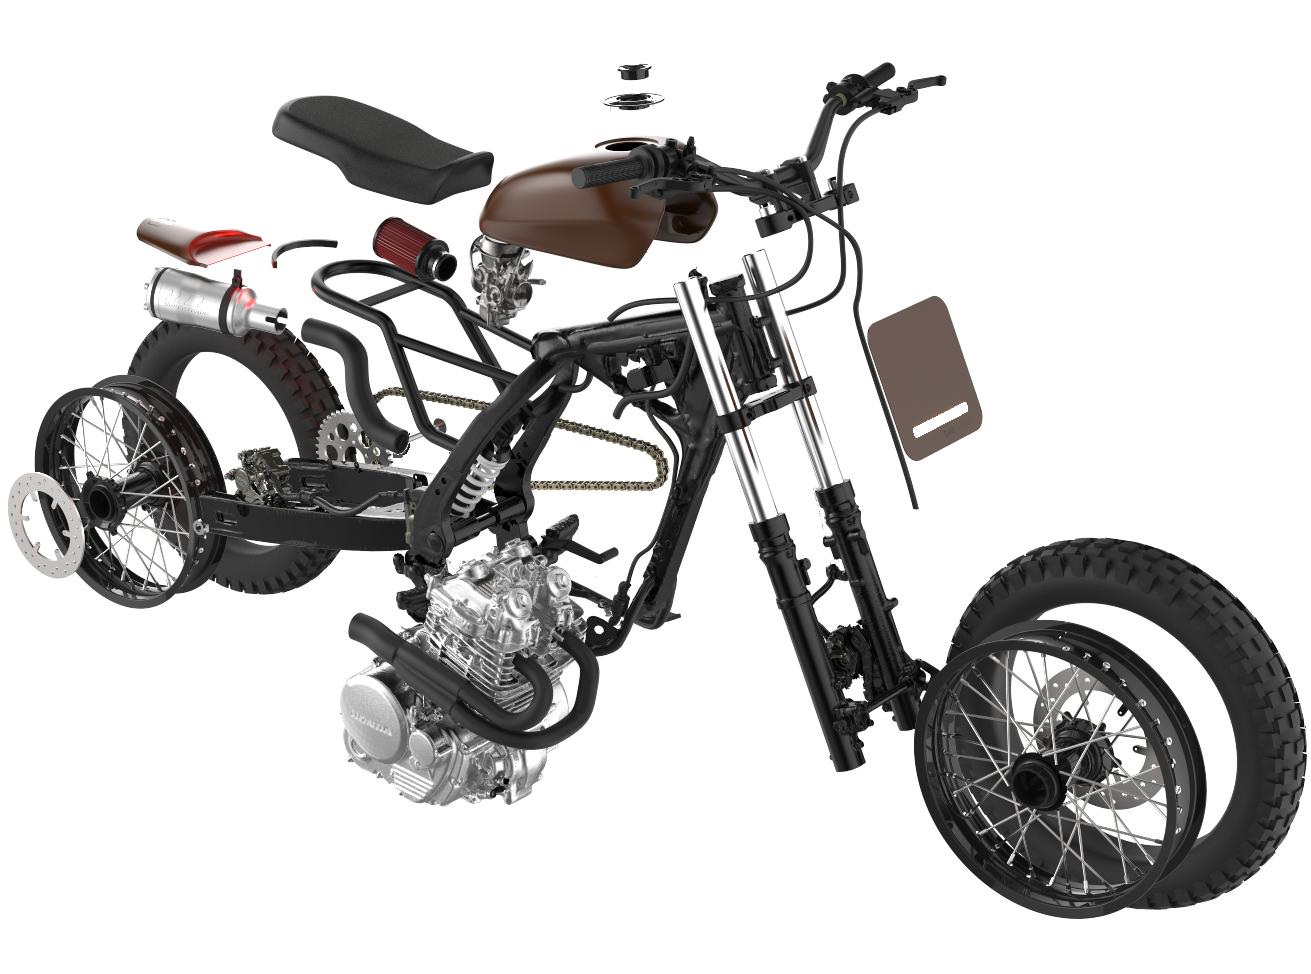 Dab Design - Motorcycle Design   Engineering   bikes ... e49ad46bcc2